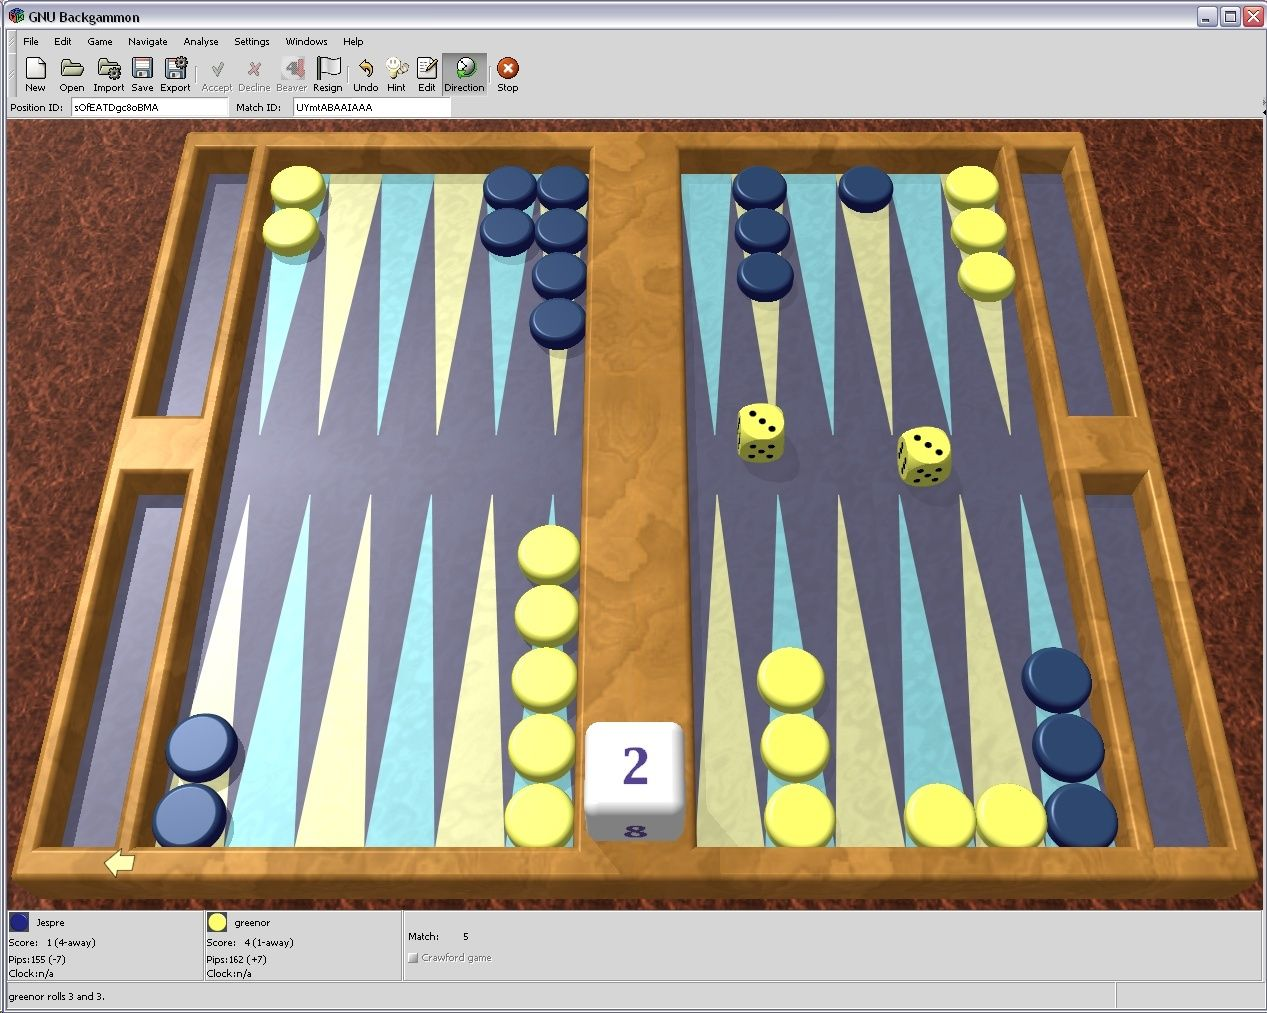 GNU Backgammon 1.06.002 - Παίξτε τάβλι Gnubg_10